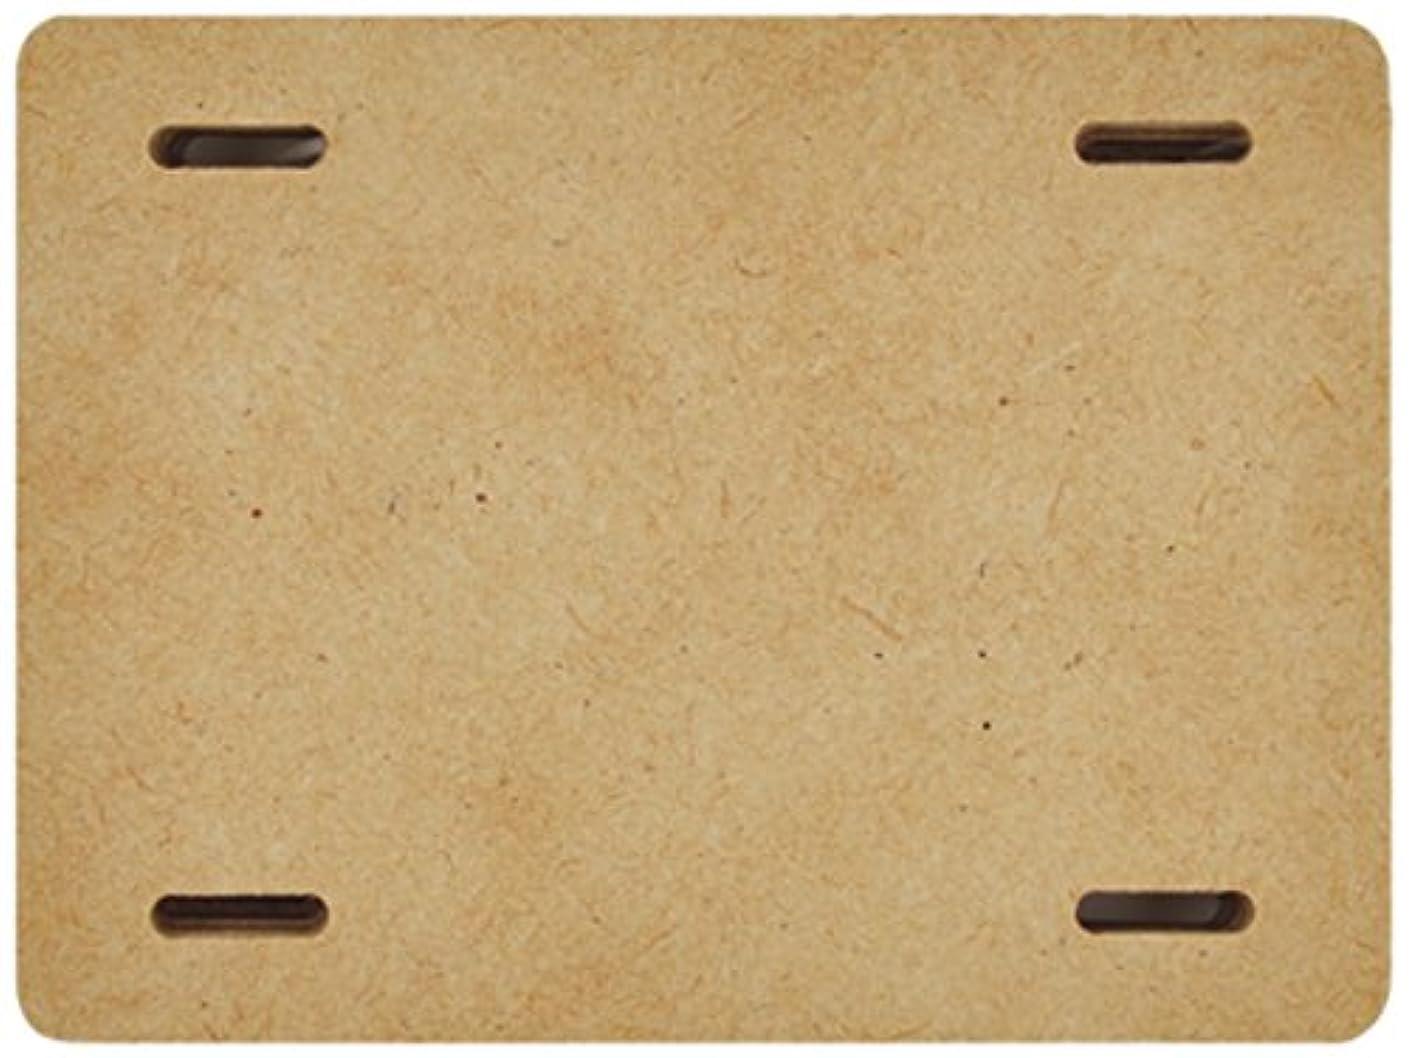 Kaisercraft SB2405 Beyond The Page MDF Mini Album, 4